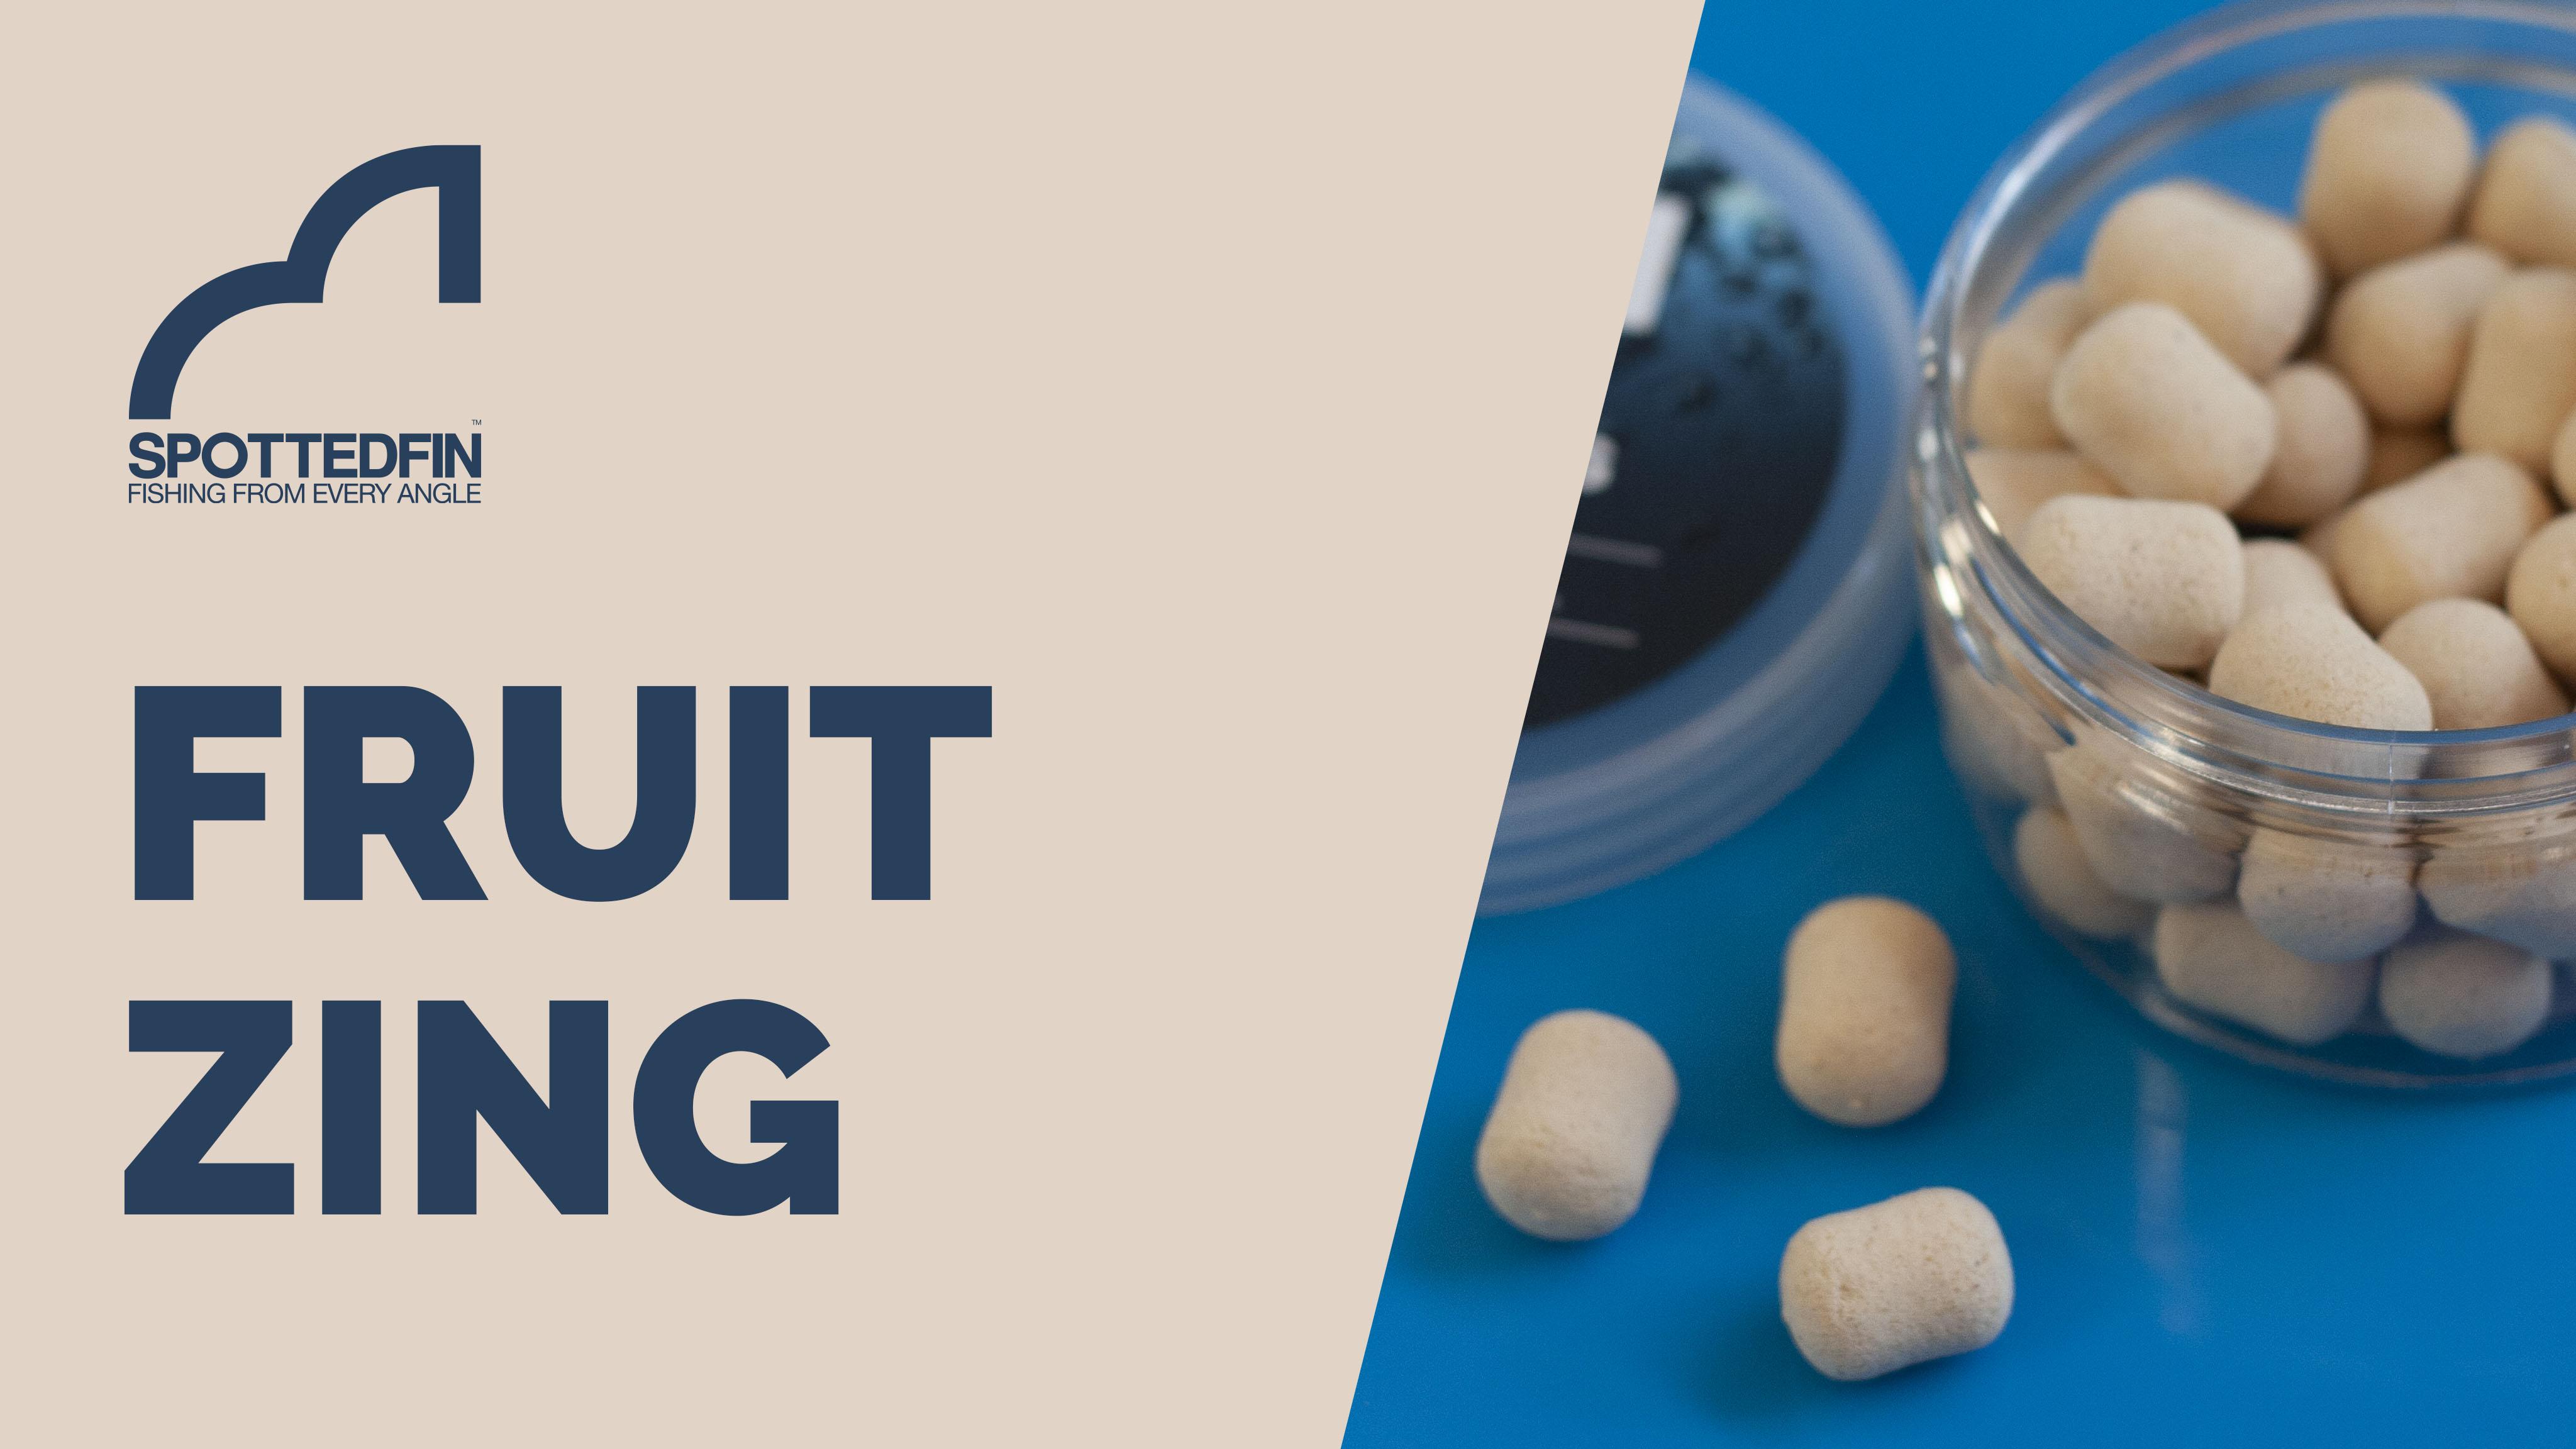 Spotted Fin - Produkty Fruit Zing